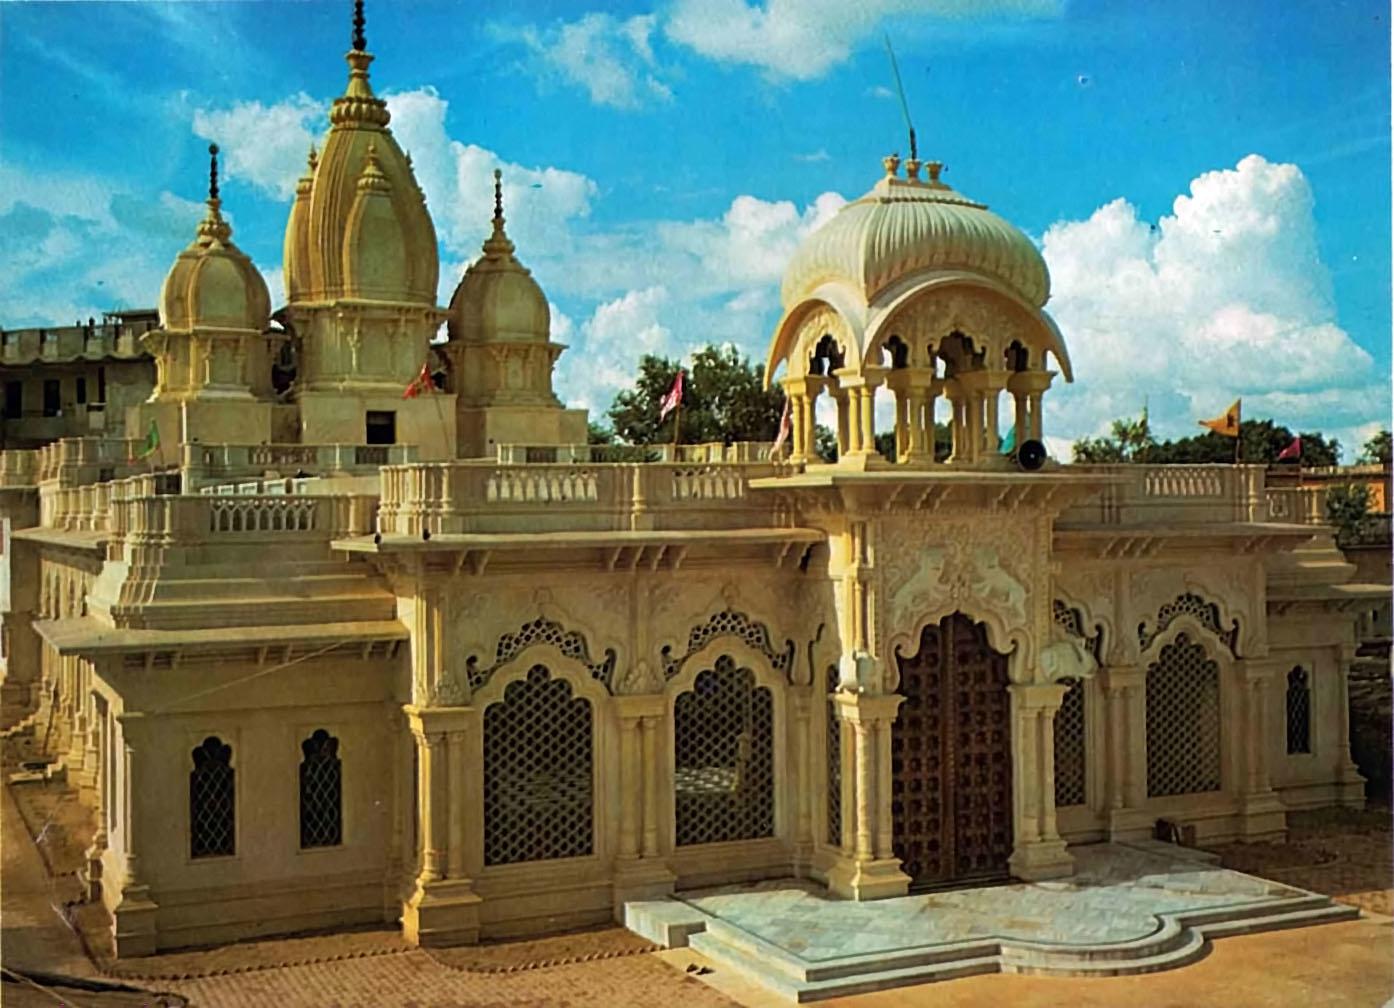 The International Society For Krishna Consciousness